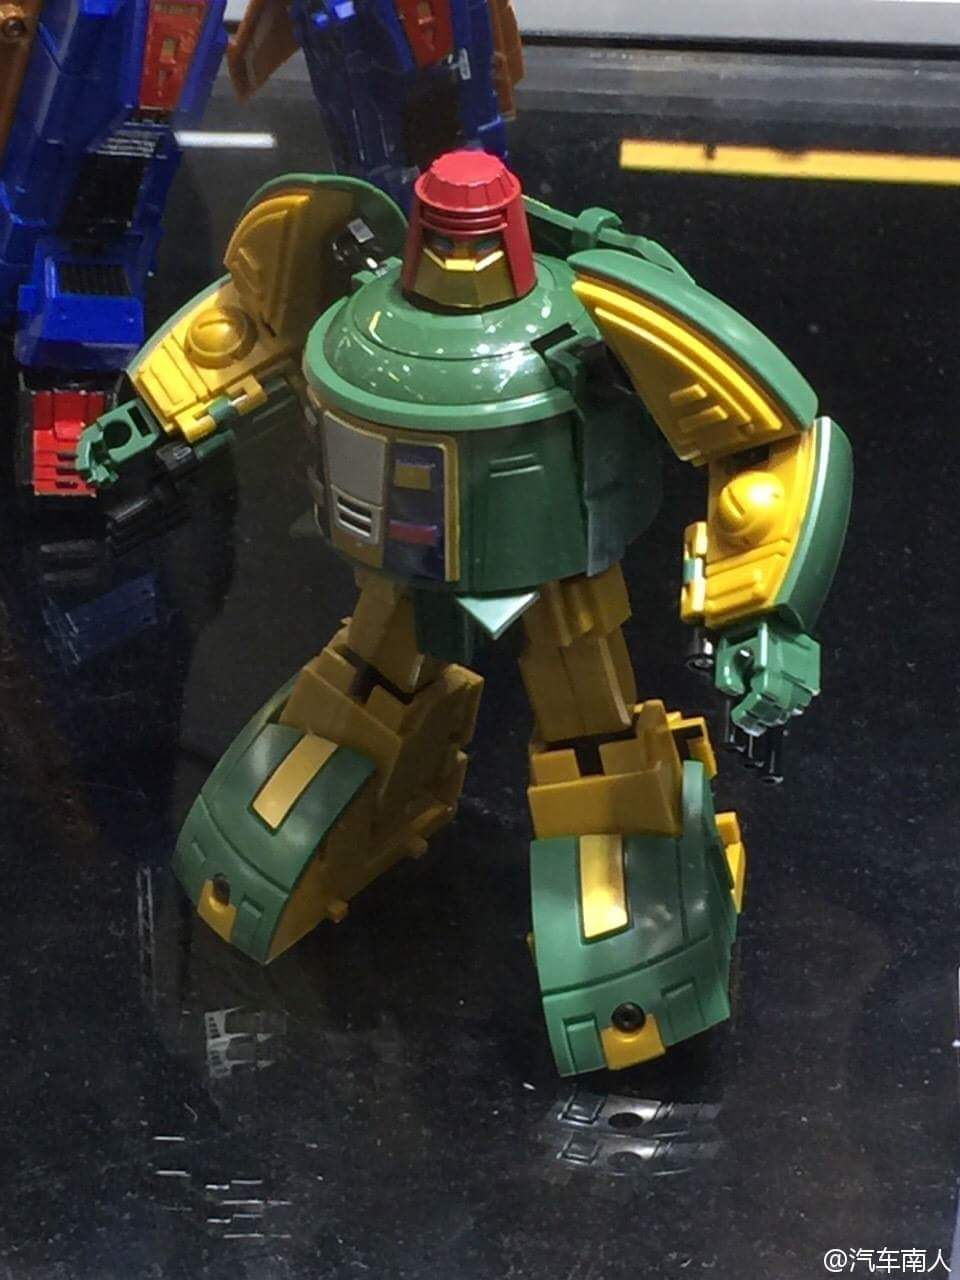 [Toyworld][Zeta Toys] Produit Tiers - Minibots MP - Gamme EX - Page 2 BAH5QO71